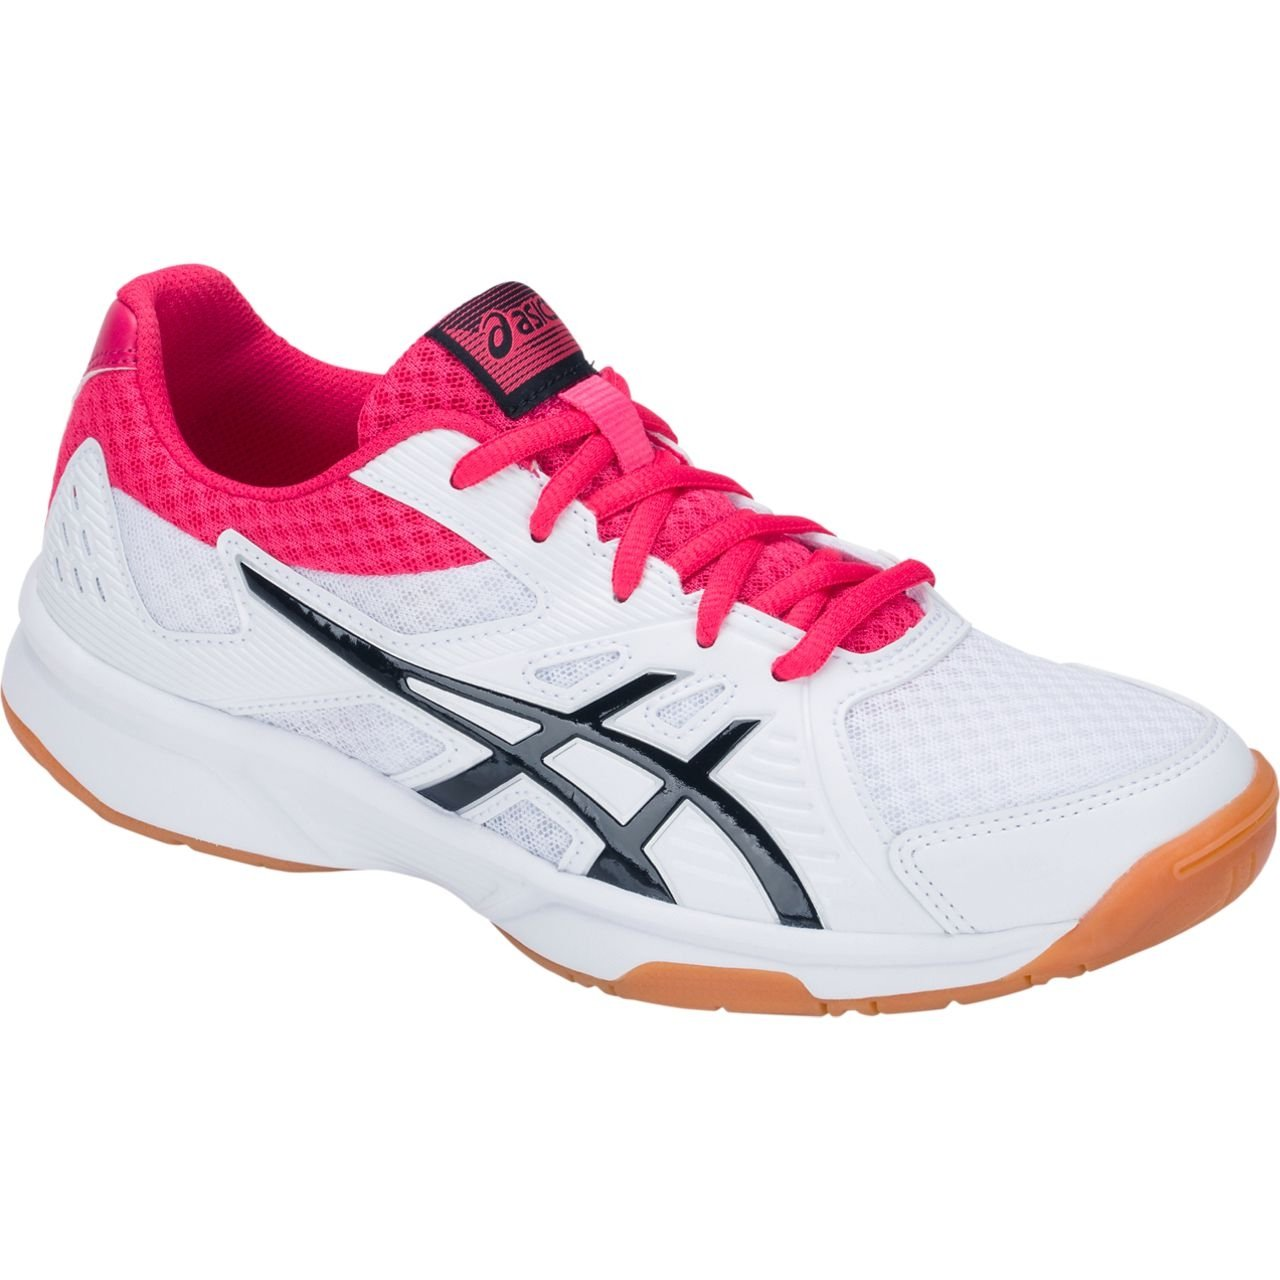 ASICS Upcourt 3 Shoe Women's Volleyball B077NGYX4X 6 B(M) US|White/Pixel Pink